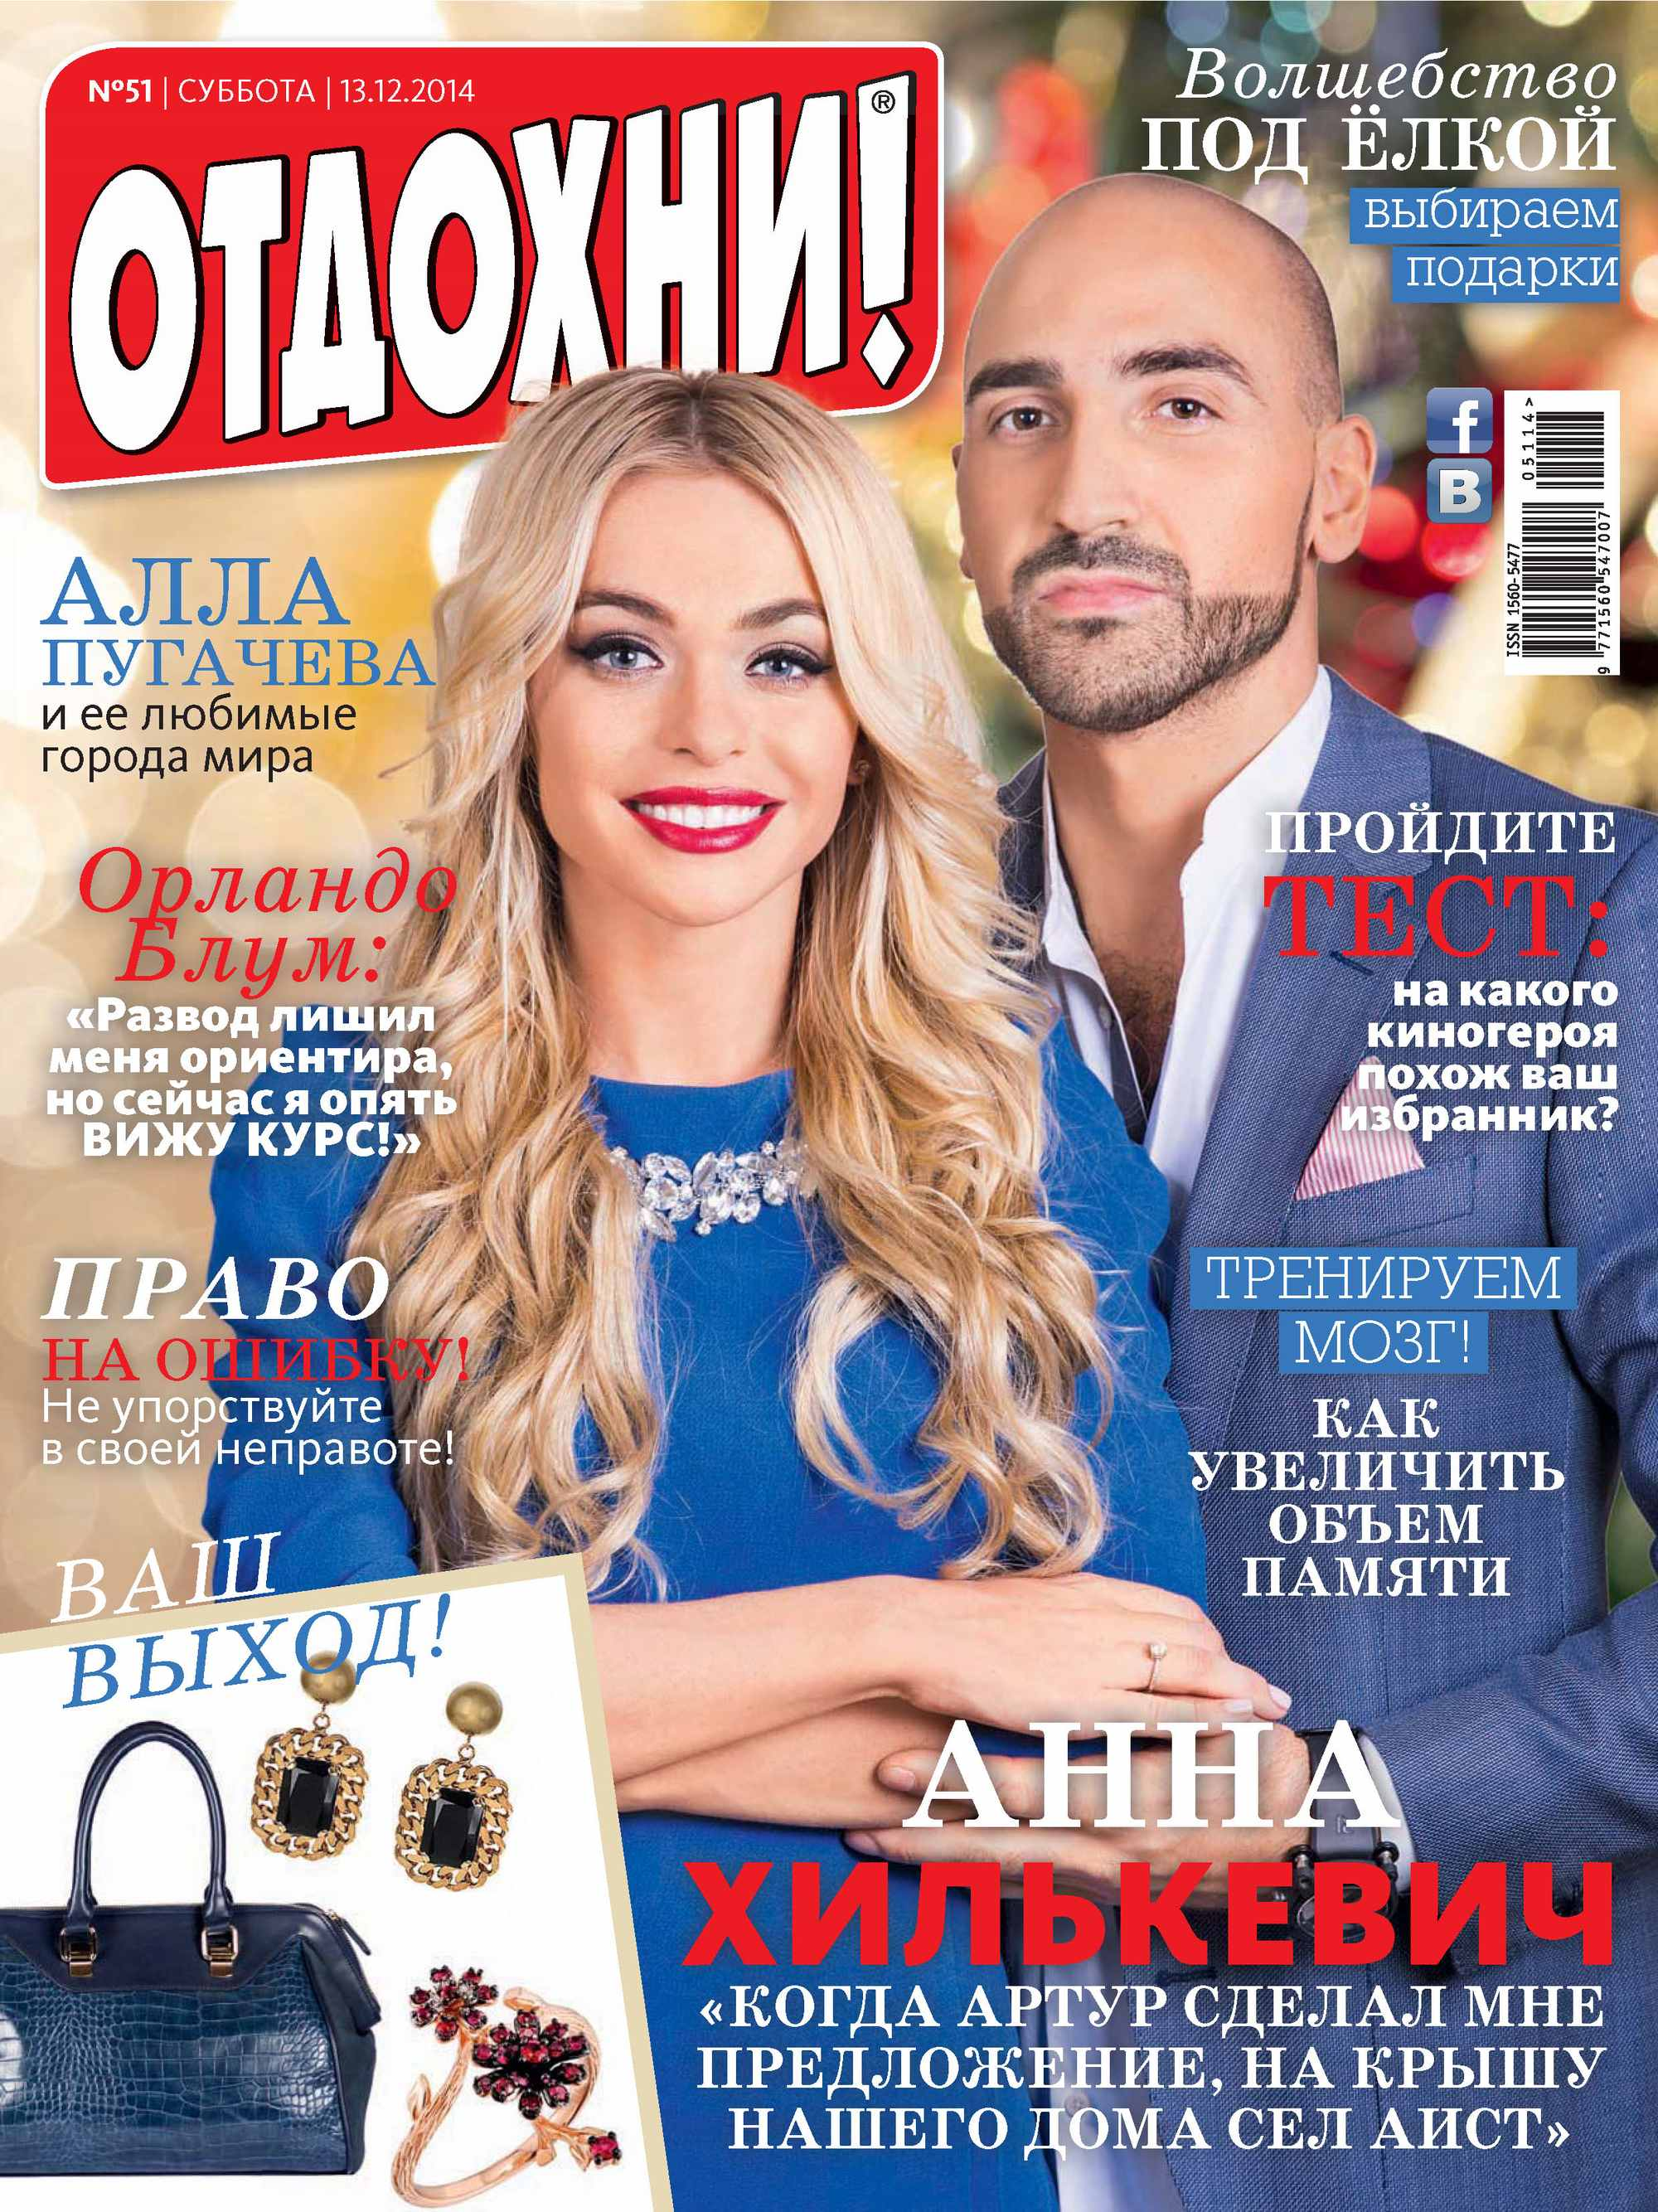 ИД «Бурда» Журнал «Отдохни!» №51/2014 ид бурда журнал отдохни 33 2014